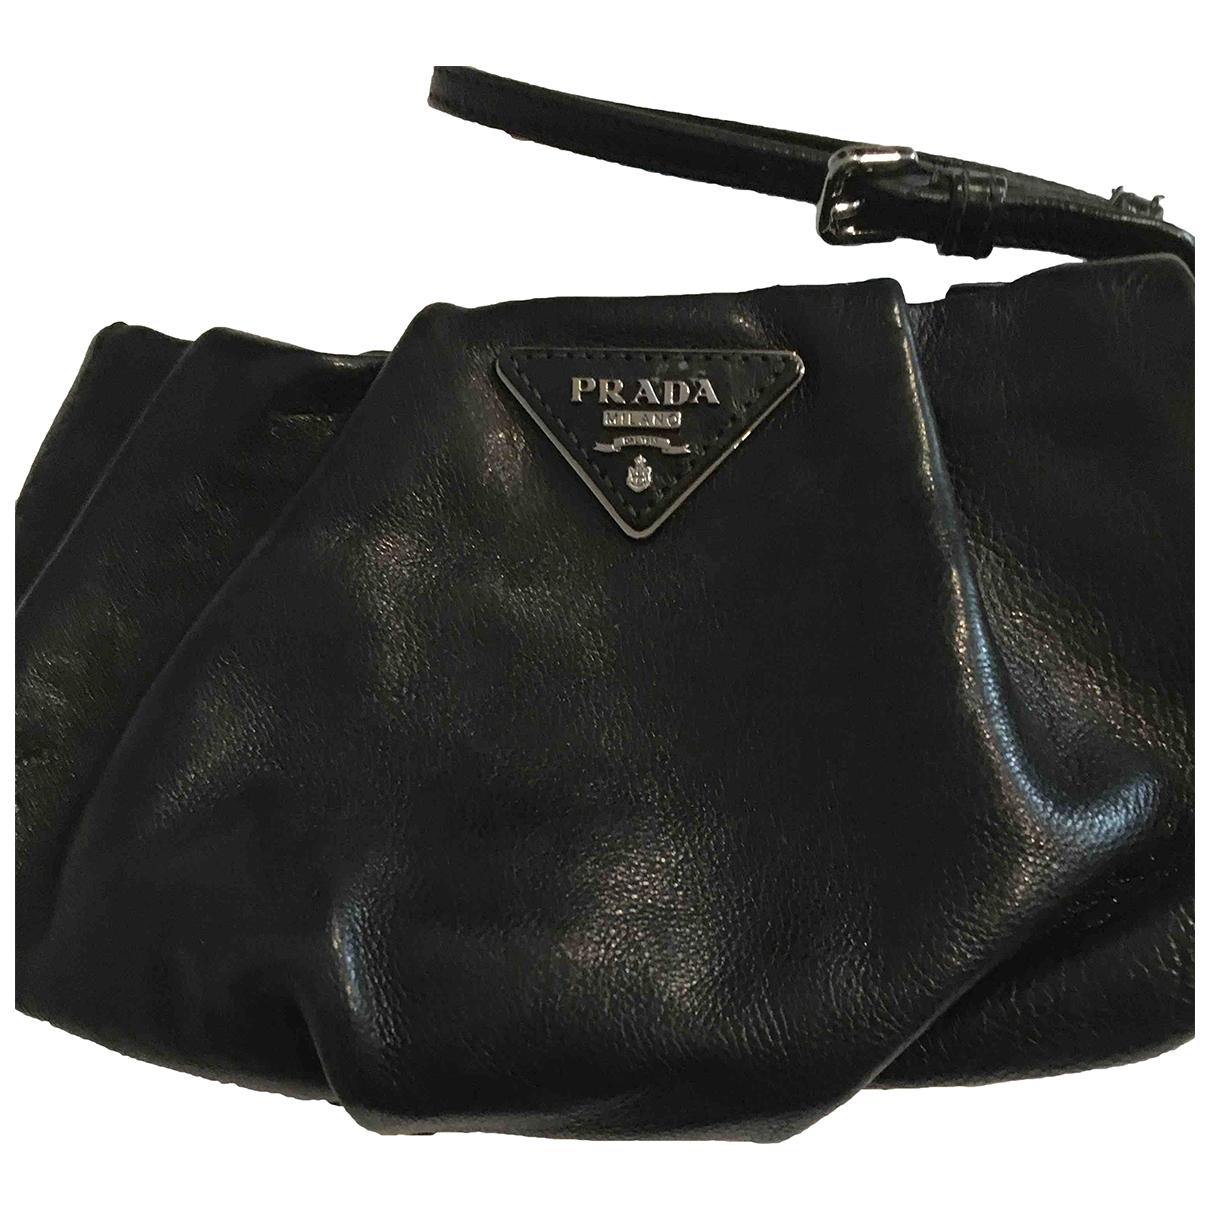 Prada \N Black Leather Clutch bag for Women \N